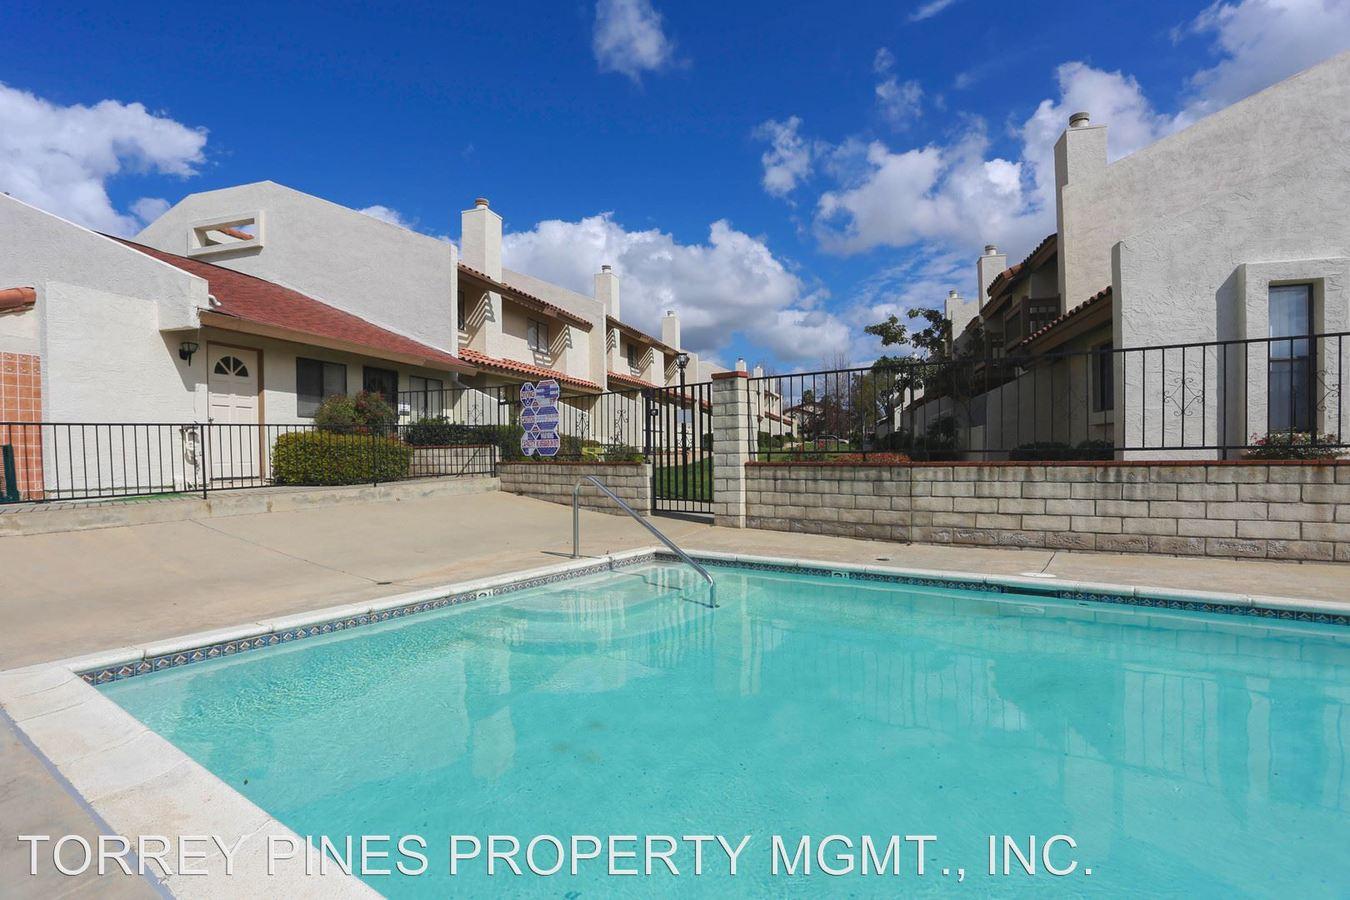 2 Bedrooms 2 Bathrooms Apartment for rent at 1141 N. Escondido Boulevard in Escondido, CA